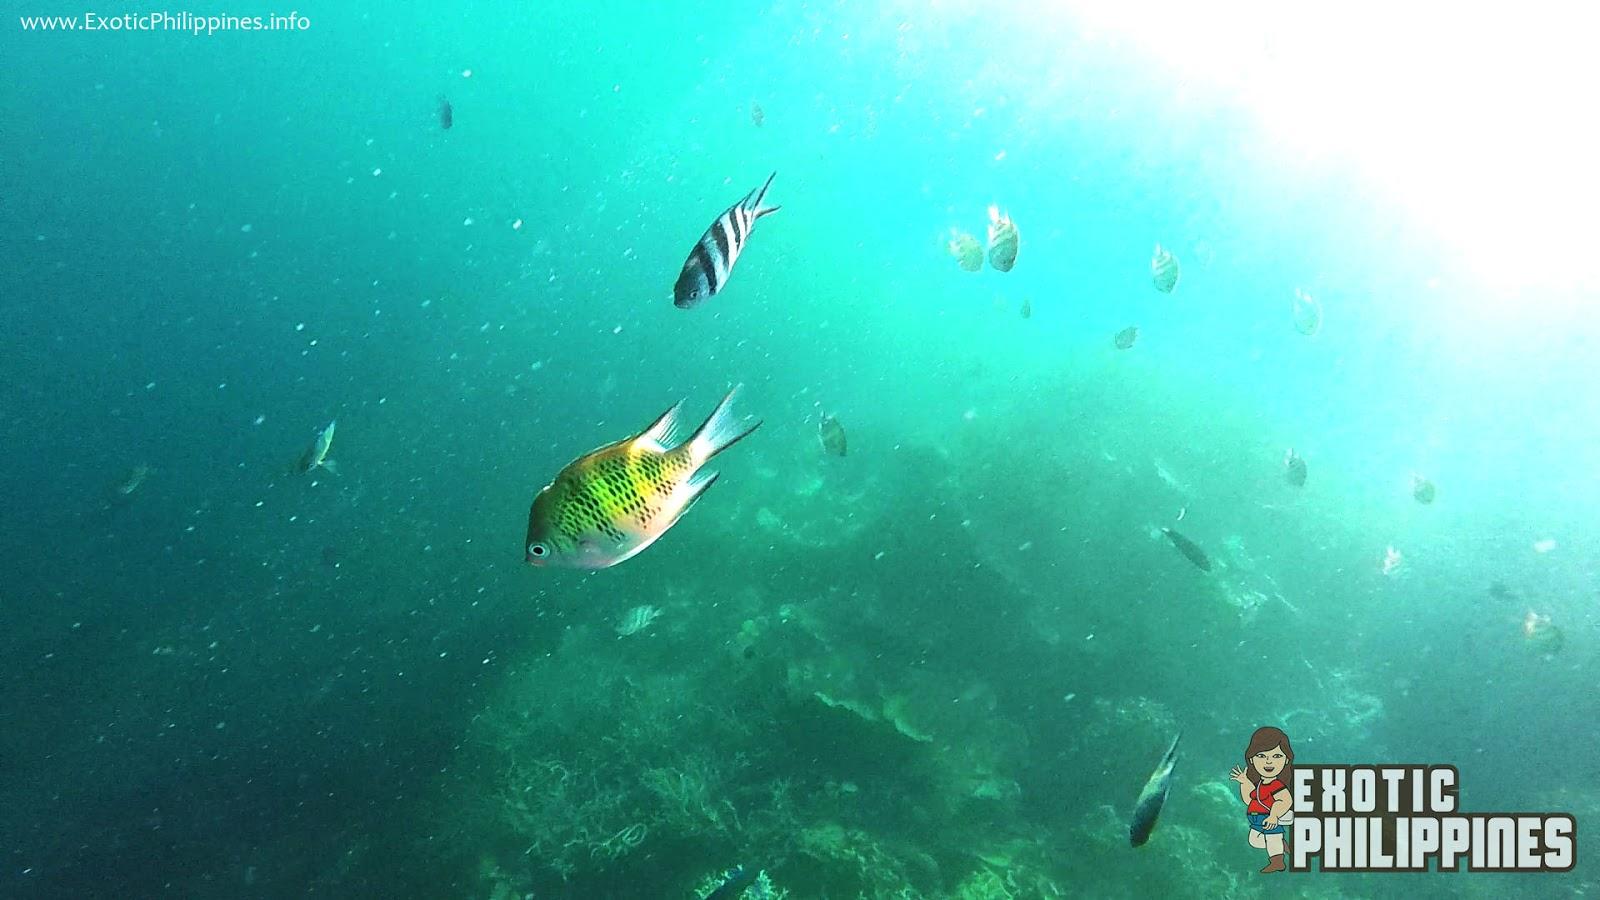 Snorkeling at the Siete Pecados of Coron Palawan Exotic Philippines Travel Blog Gay Aida Dumaguing